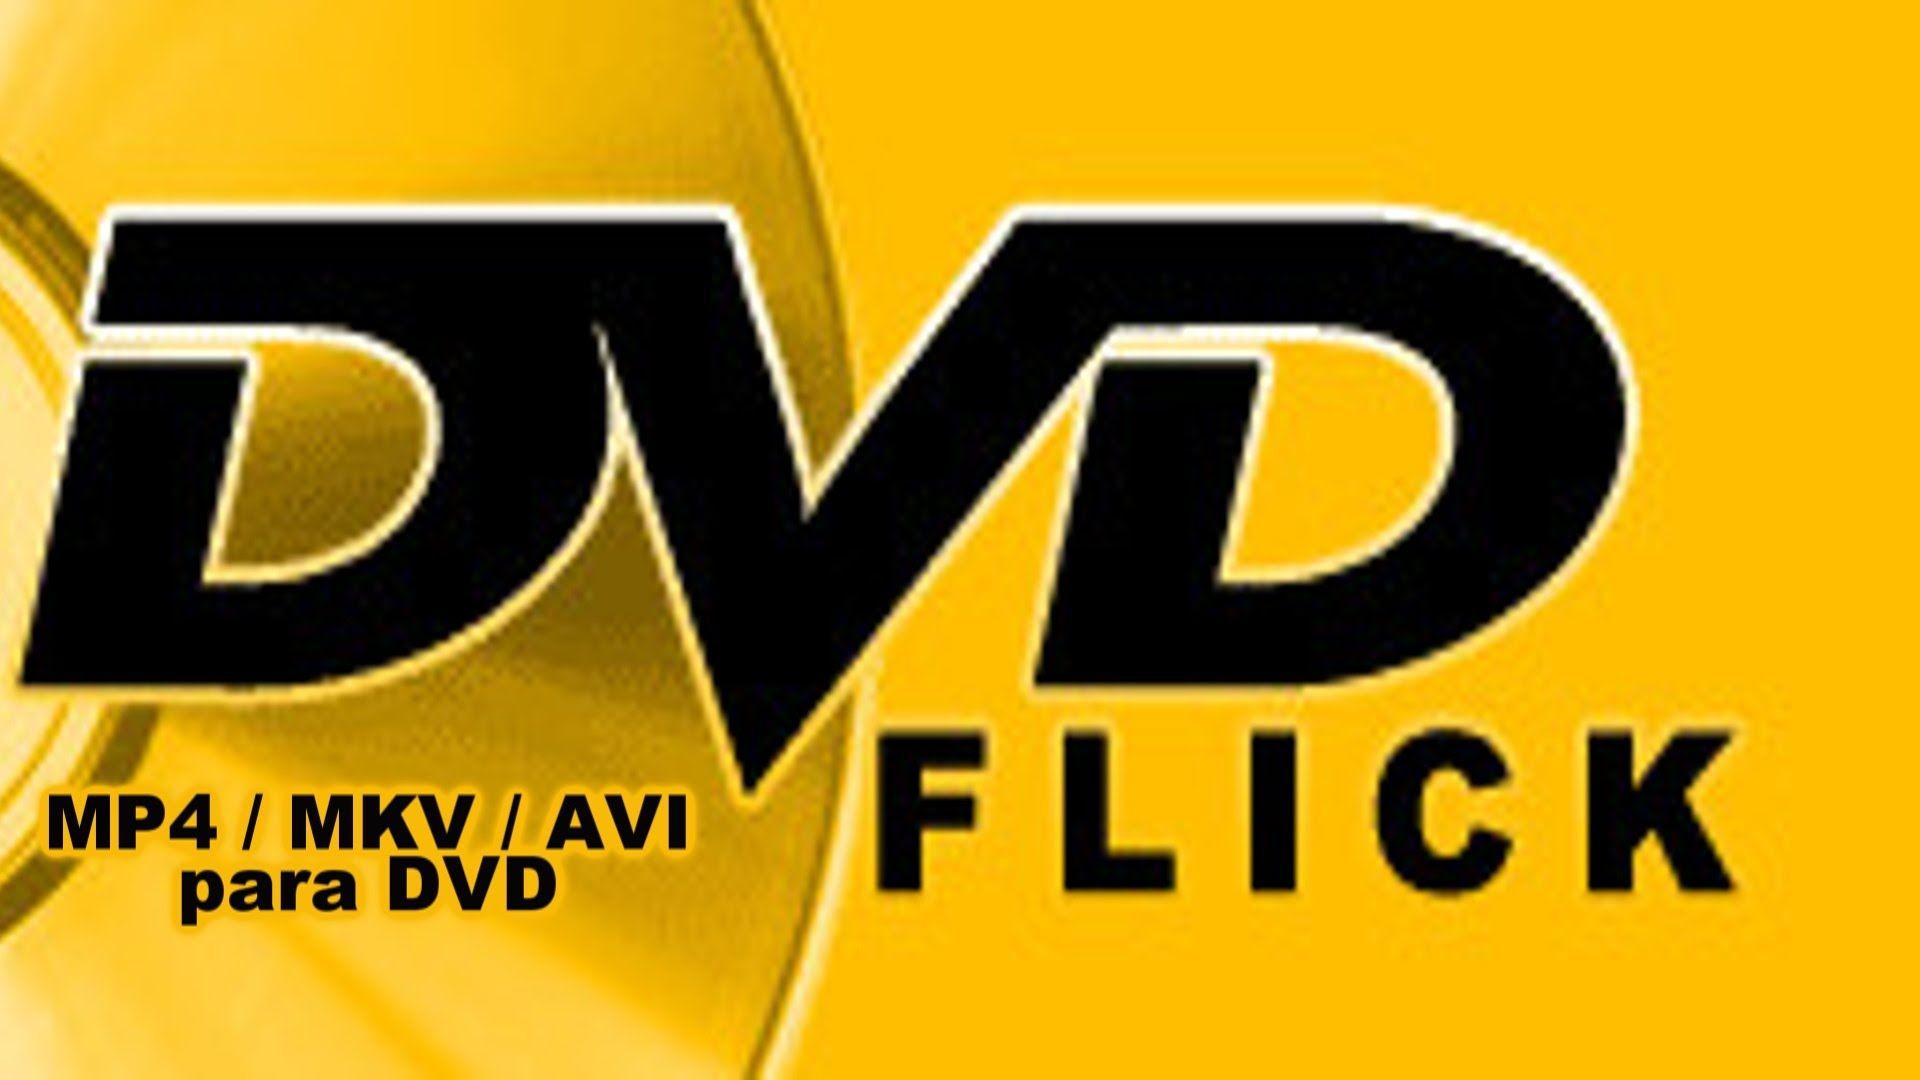 DVD Flick 2018 Burn DVD Download For MAC + Windows